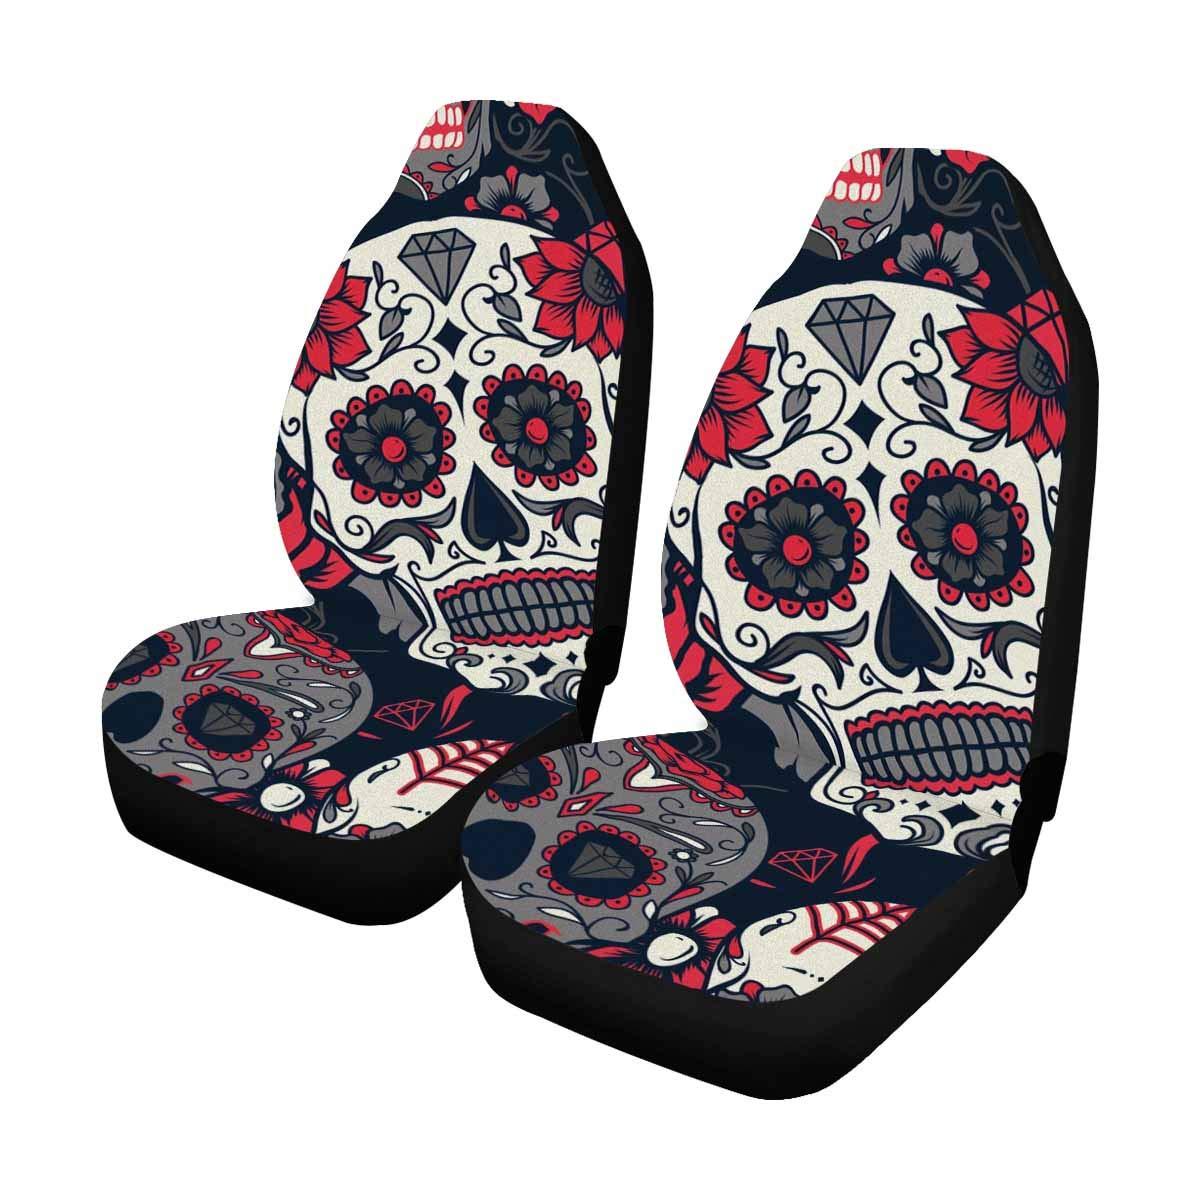 Terrific Interestprint Day Of The Dead Sugar Skull With Floral Auto Machost Co Dining Chair Design Ideas Machostcouk